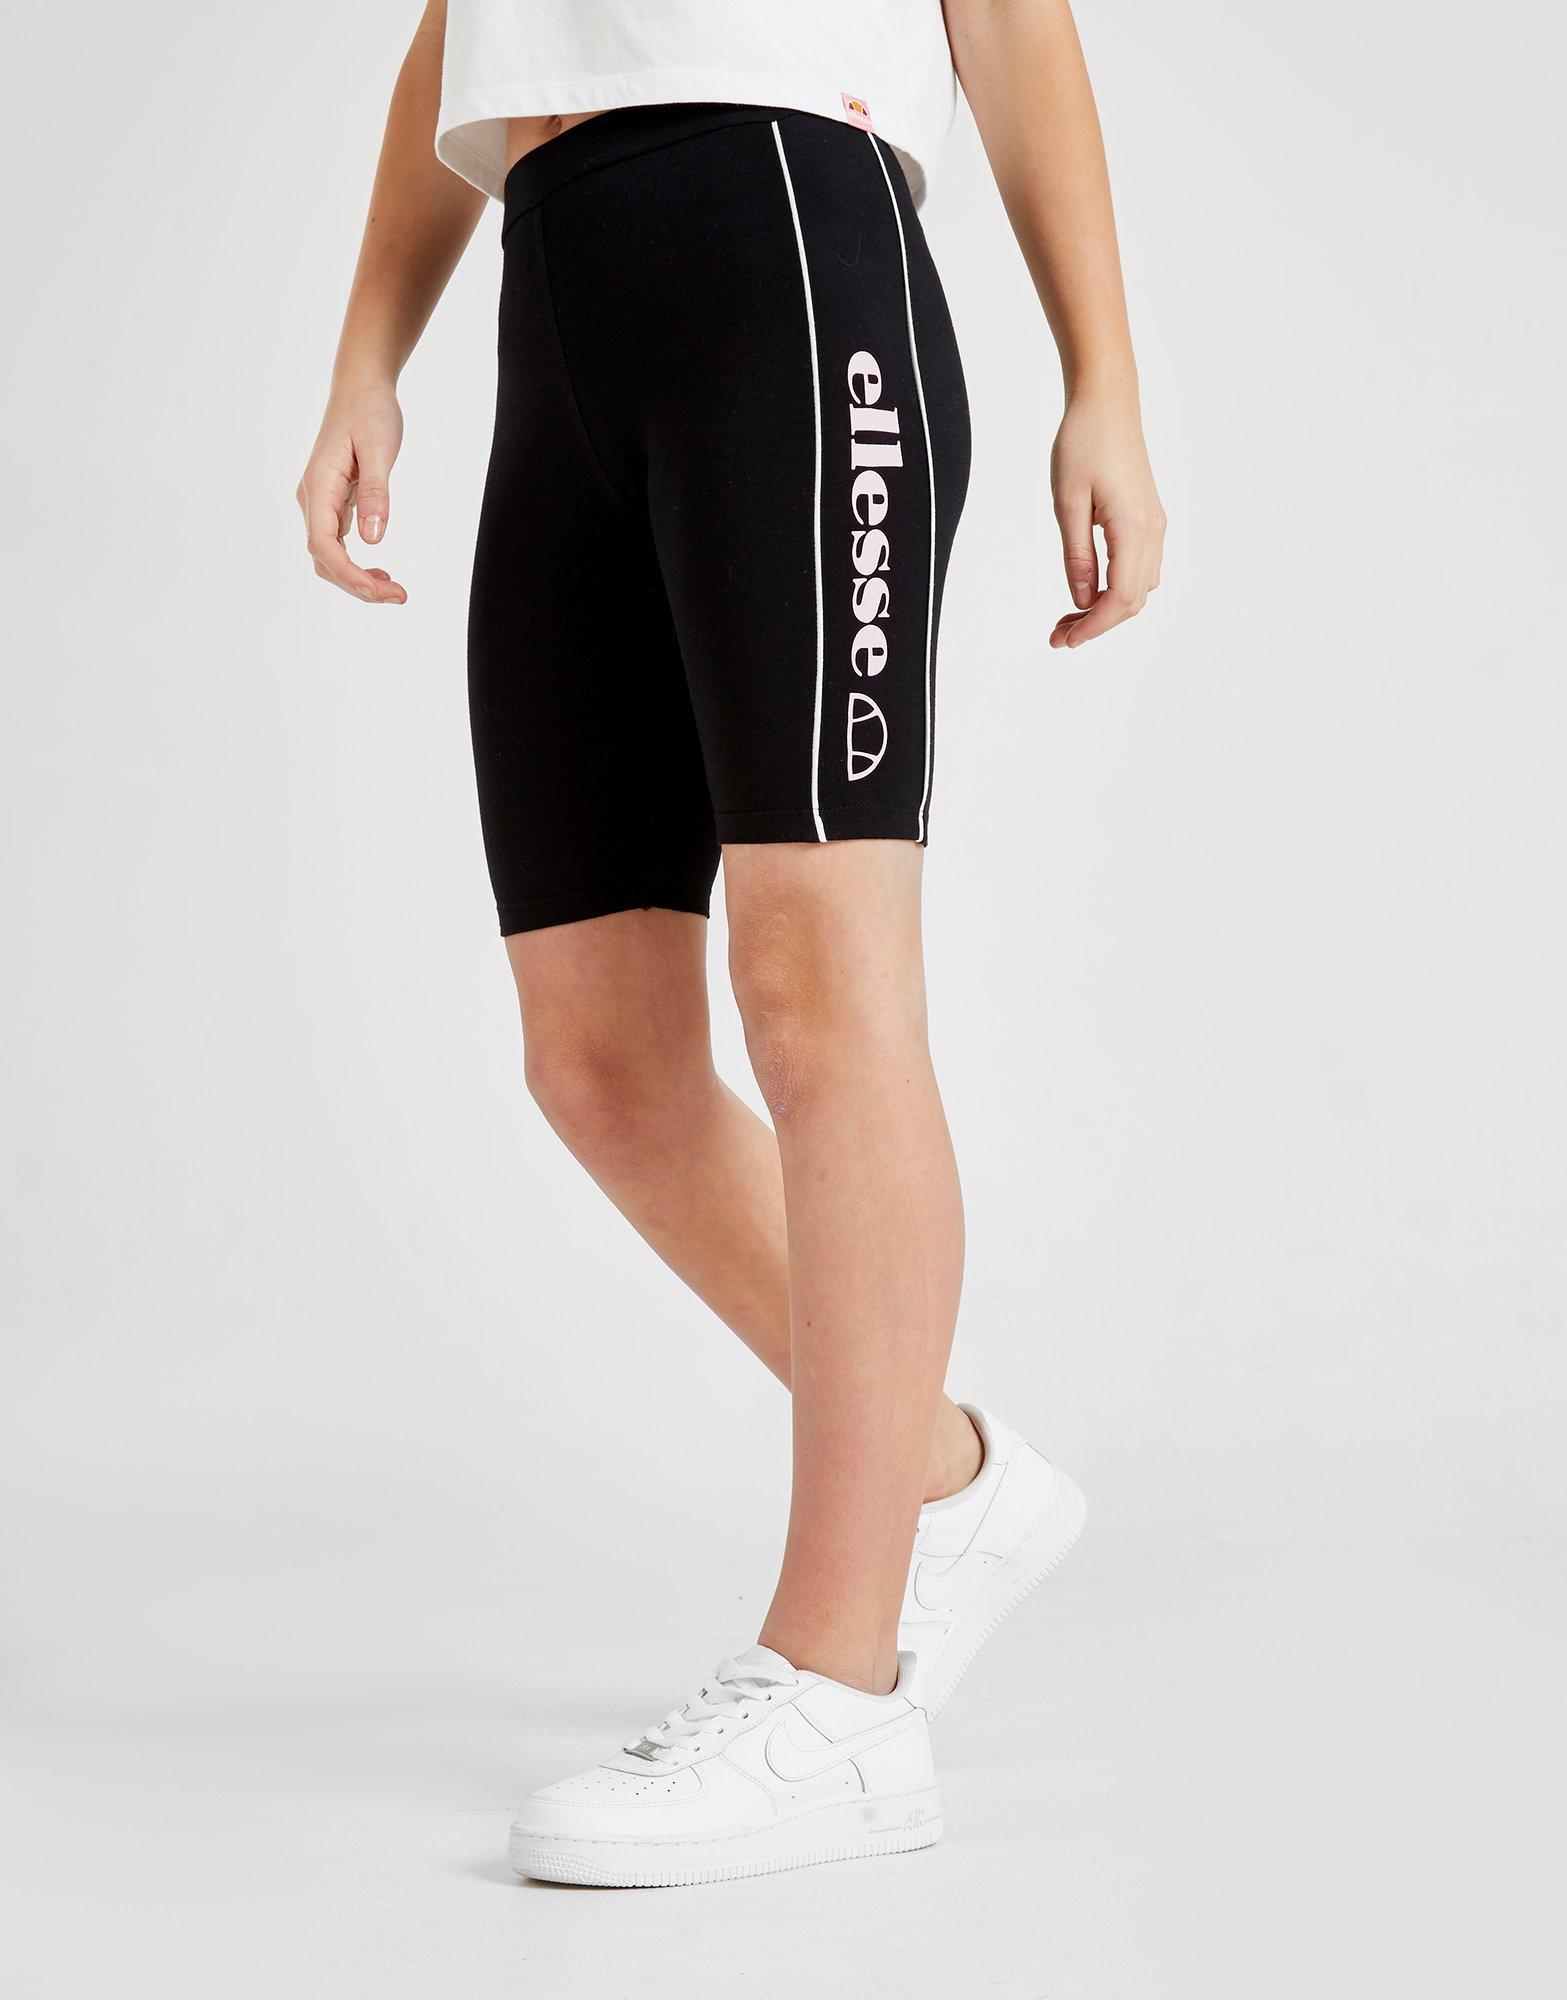 d17a547e82 Details about New Ellesse Girl's Alexus Cycle Shorts